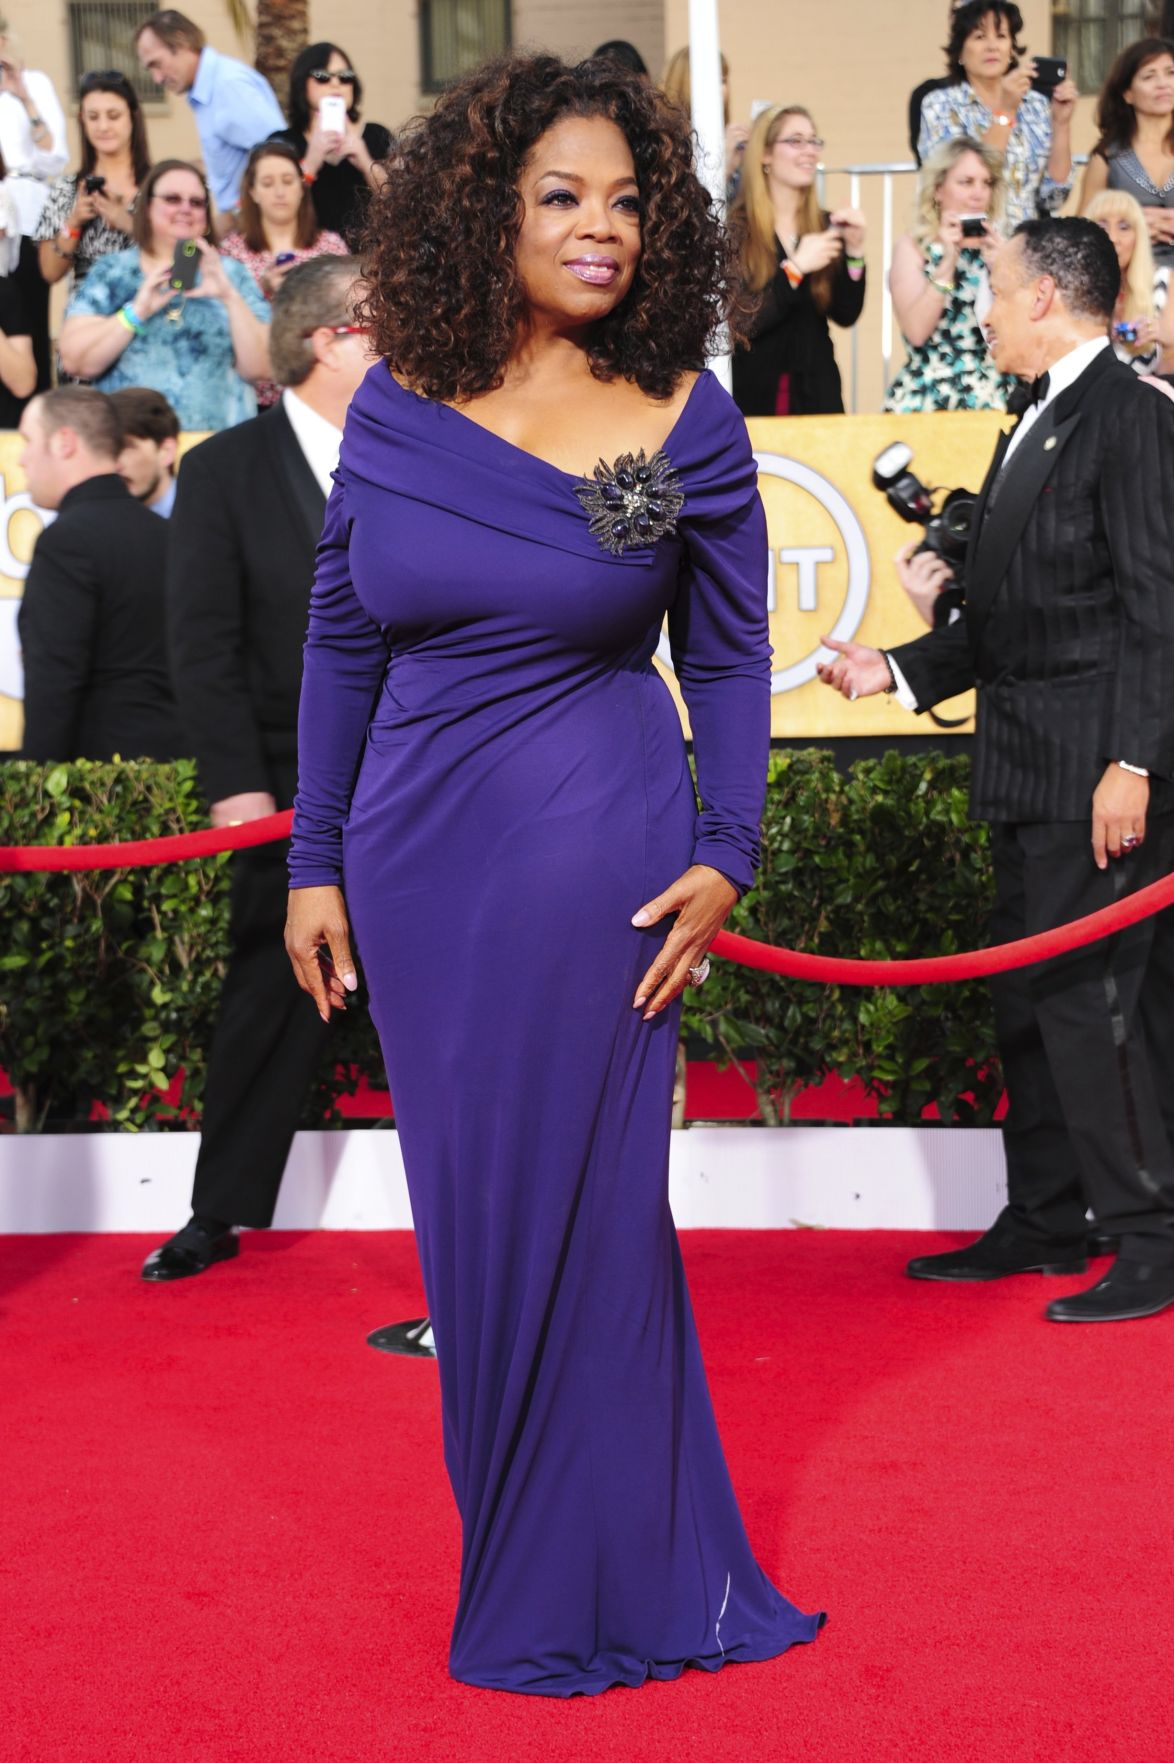 Oprah Winfreys weight loss secret Living It stlamericancom